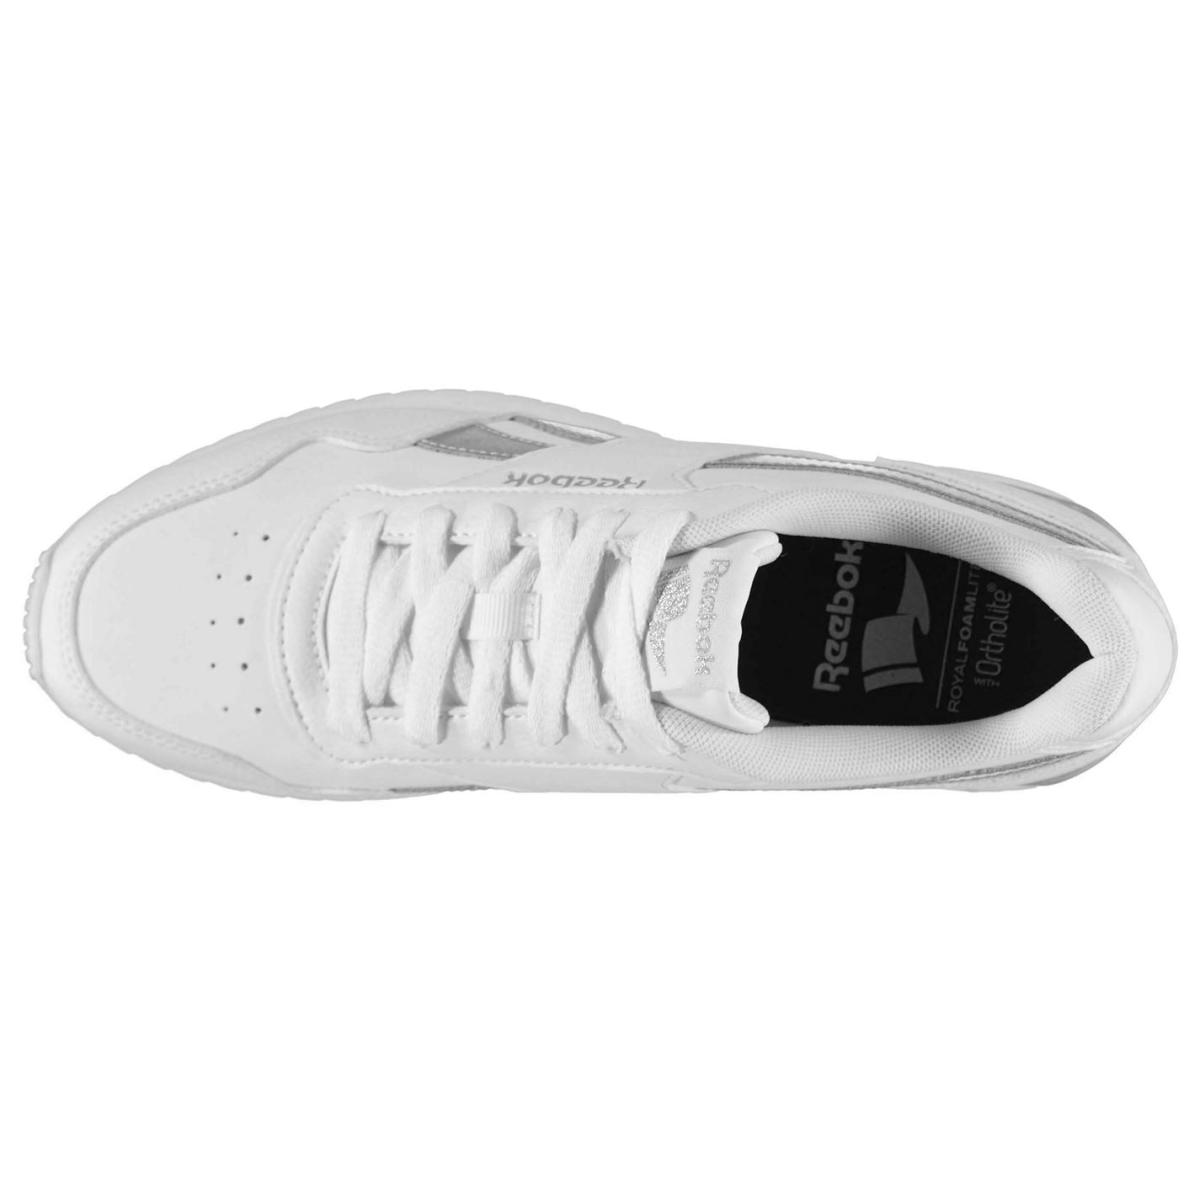 Reebok-Royal-Glide-Turnschuhe-Laufschuhe-Damen-Sneaker-Trainers-Sportschuhe-8001 Indexbild 10